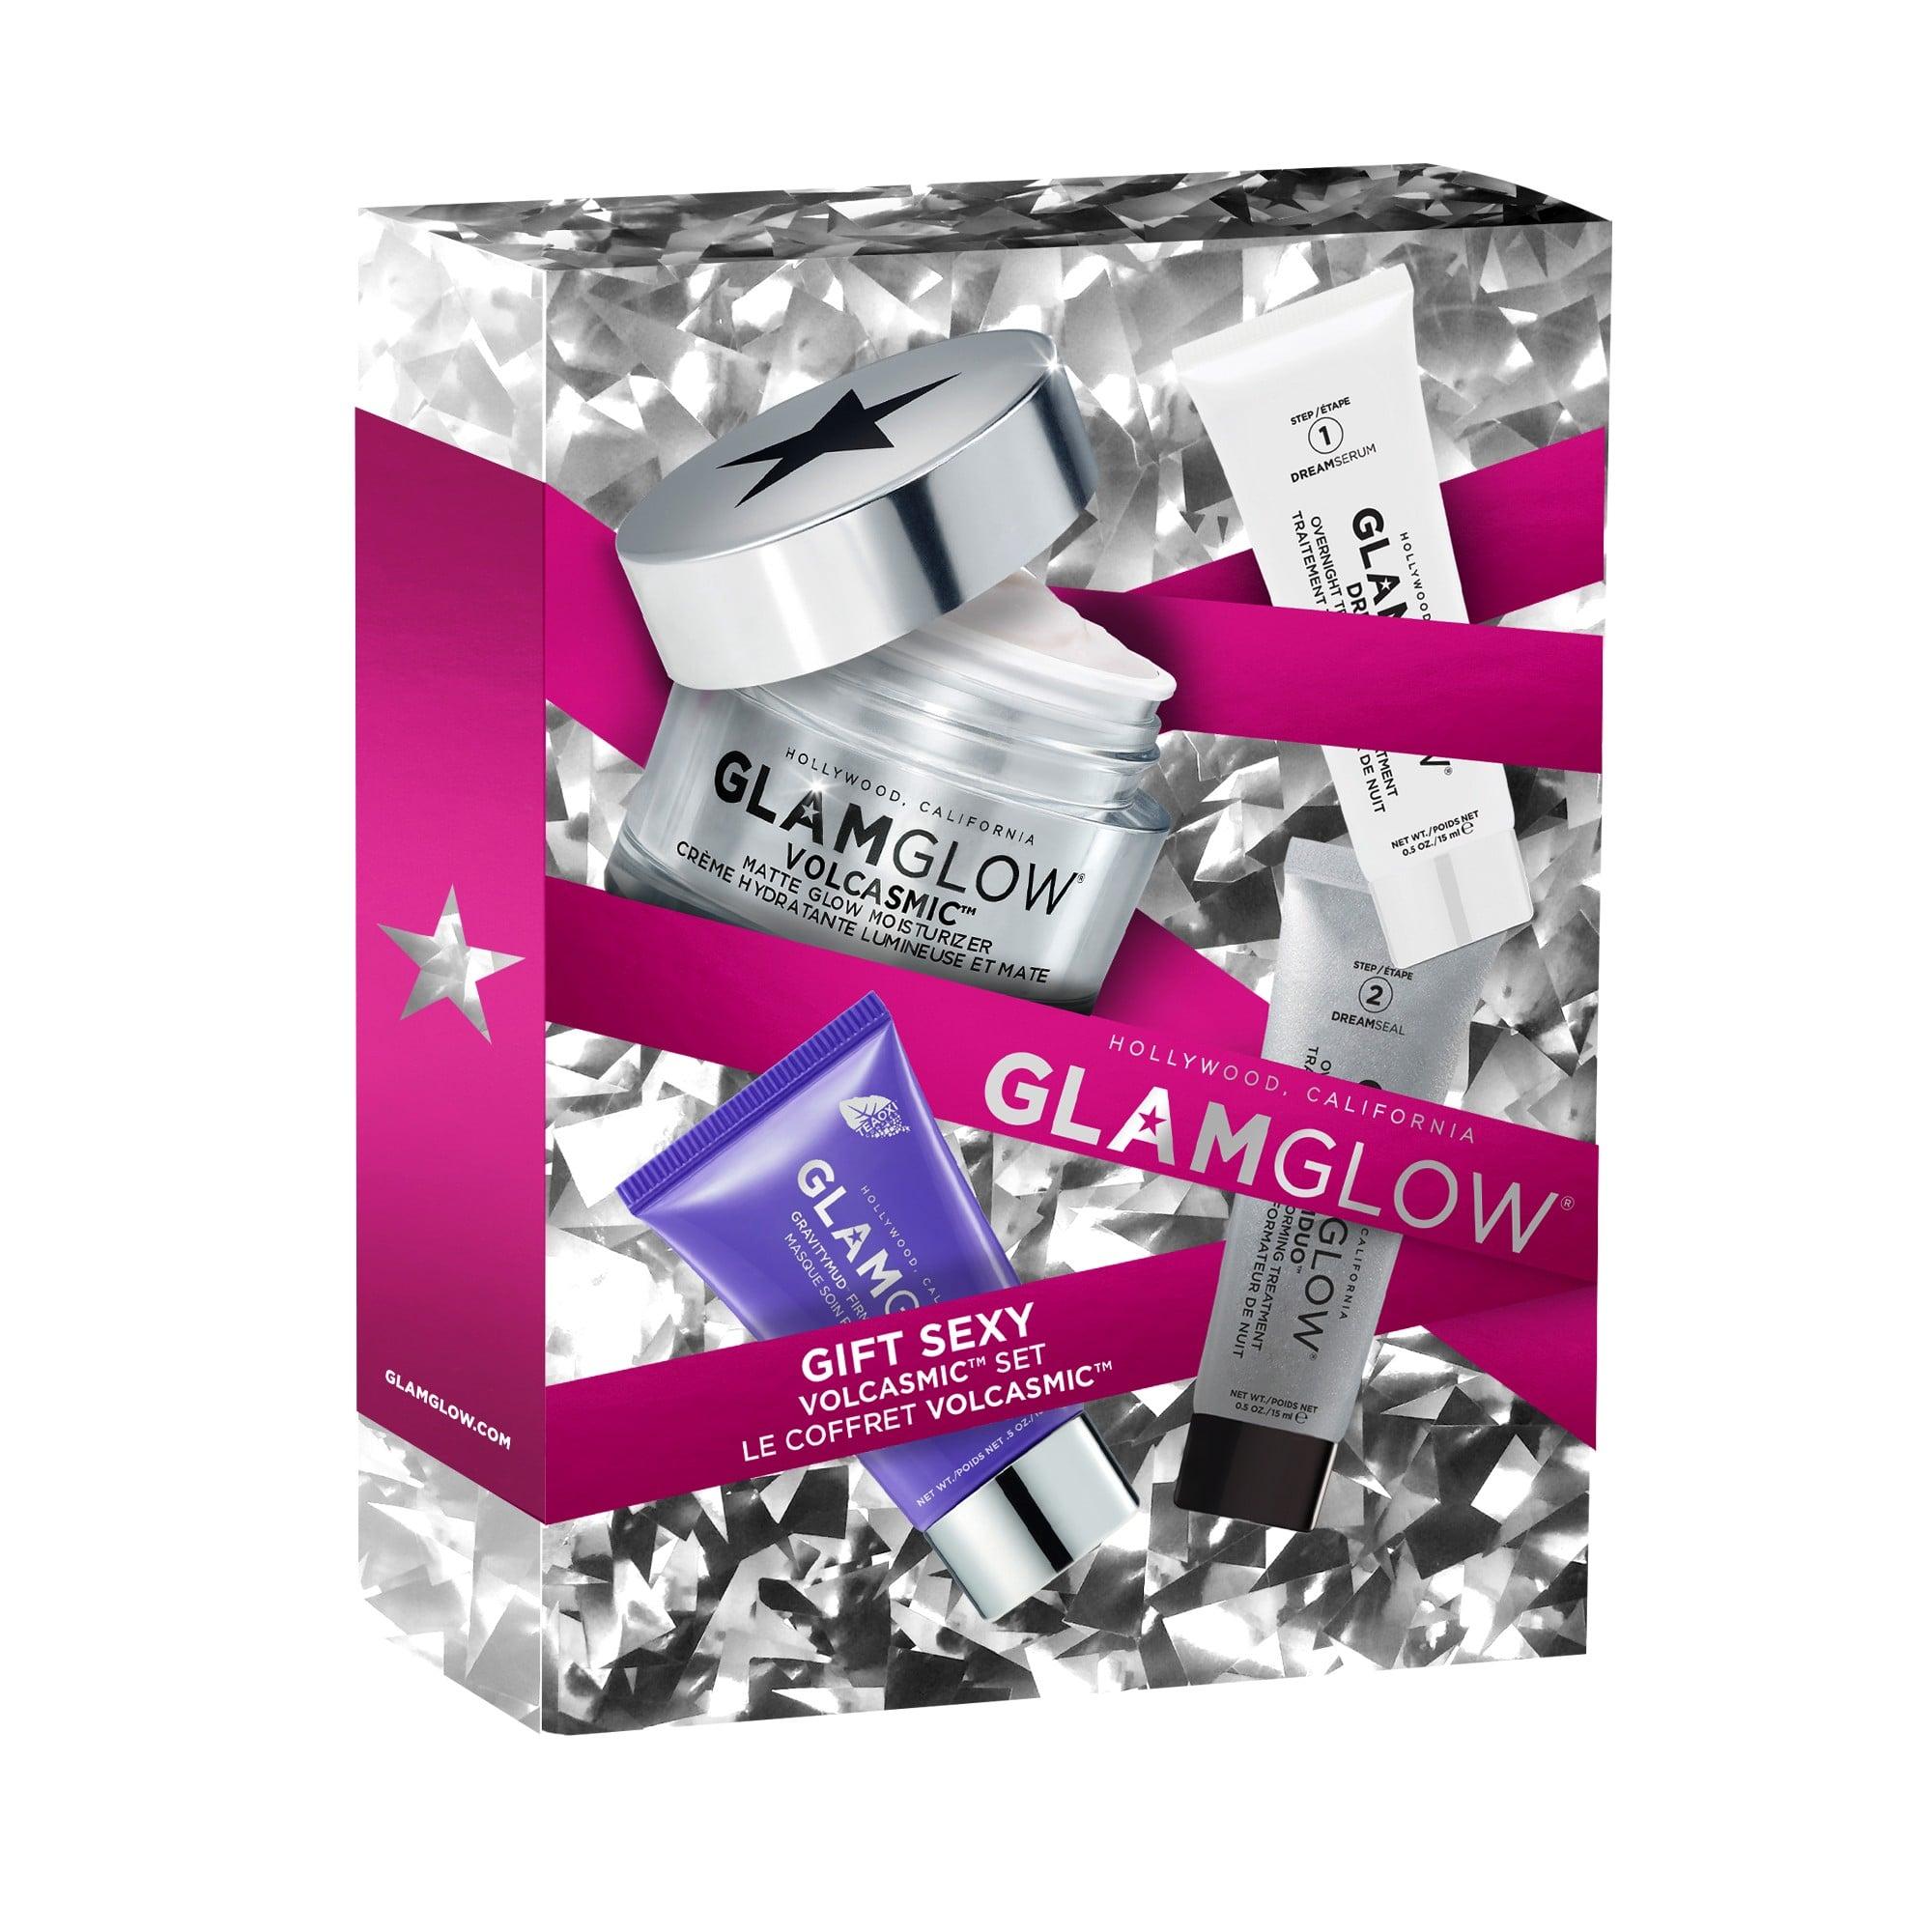 Sephora Holiday Gift Sets 2017 | POPSUGAR Beauty